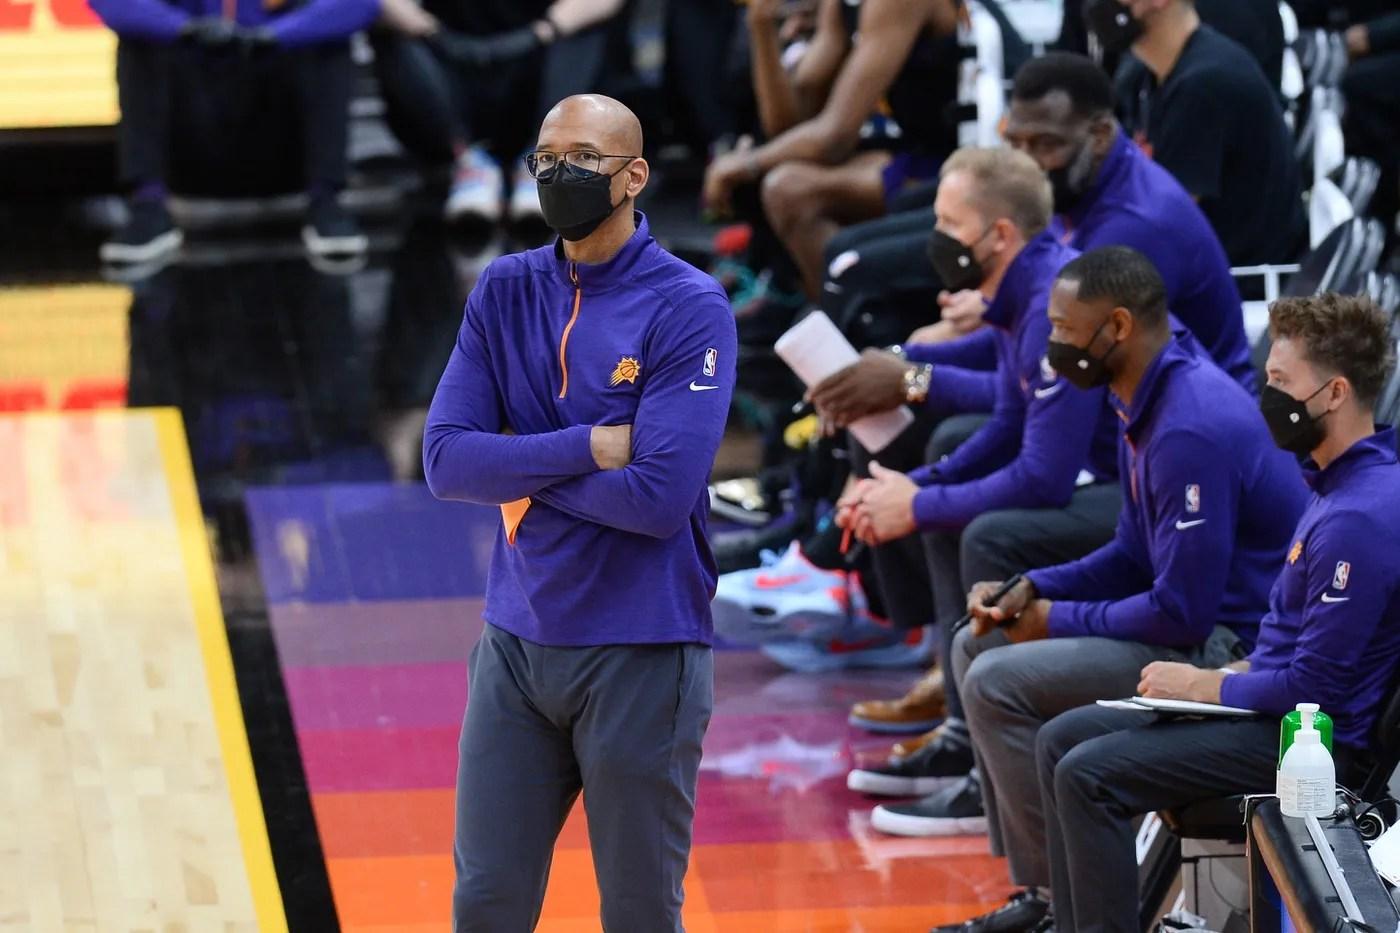 Apr 17, 2021; Phoenix, Arizona, USA; Phoenix Suns head coach Monty Williams looks on against the San Antonio Spurs during the first half at Phoenix Suns Arena. Mandatory Credit: Joe Camporeale-USA TODAY Sports